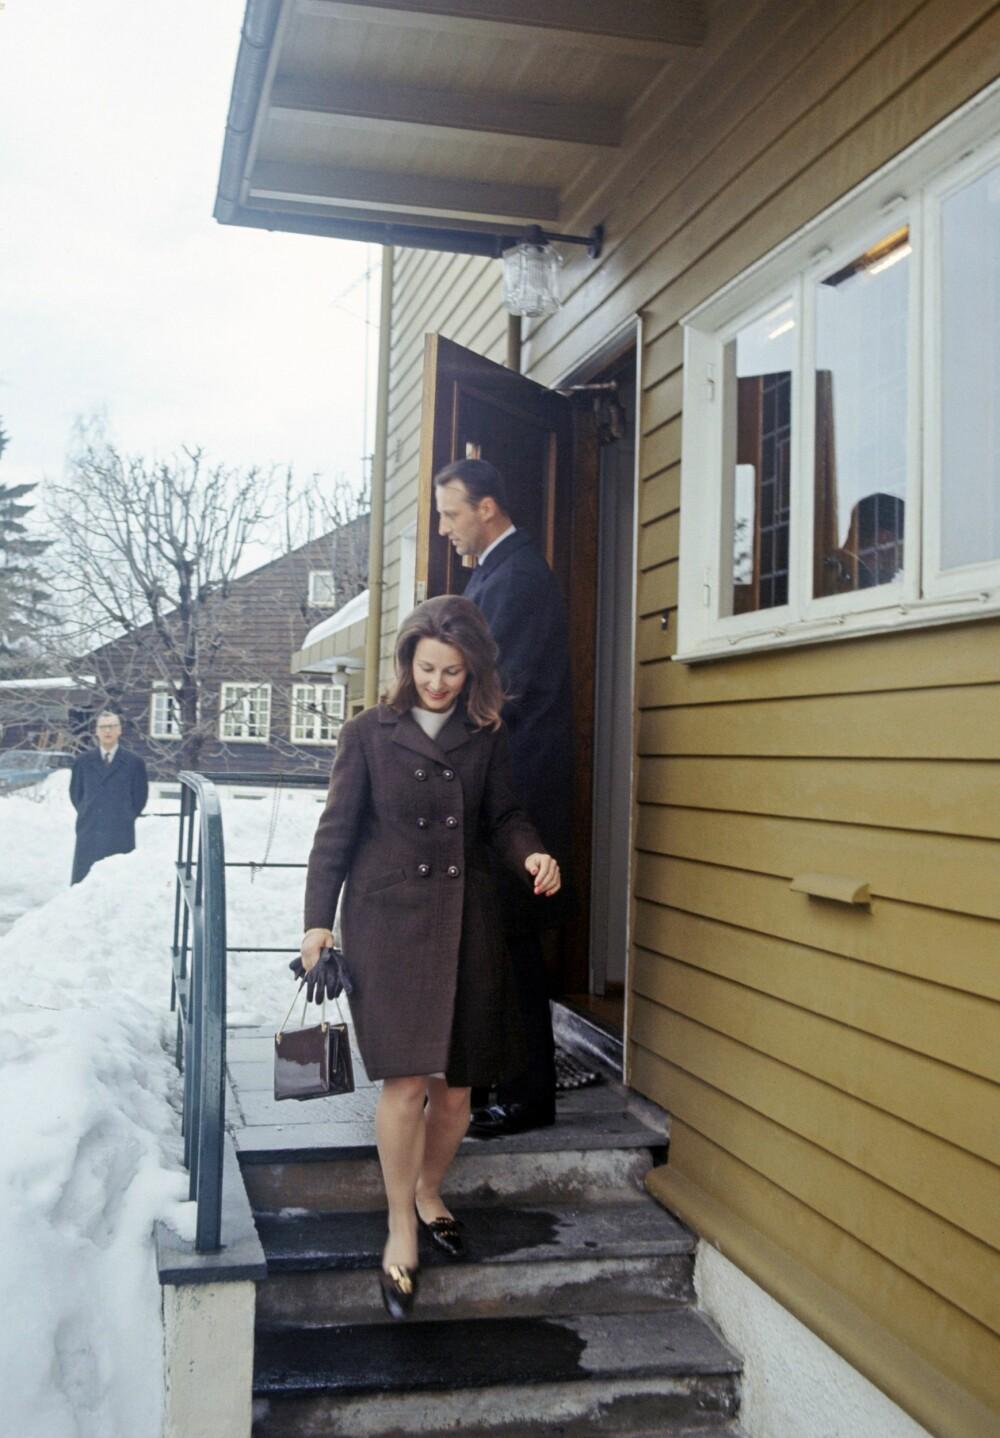 SKJULESTED: Hjemme hos Sonjas mor i Tuengen Allé på Vinderen møttes det kommende kongeparet i smug i flere år.